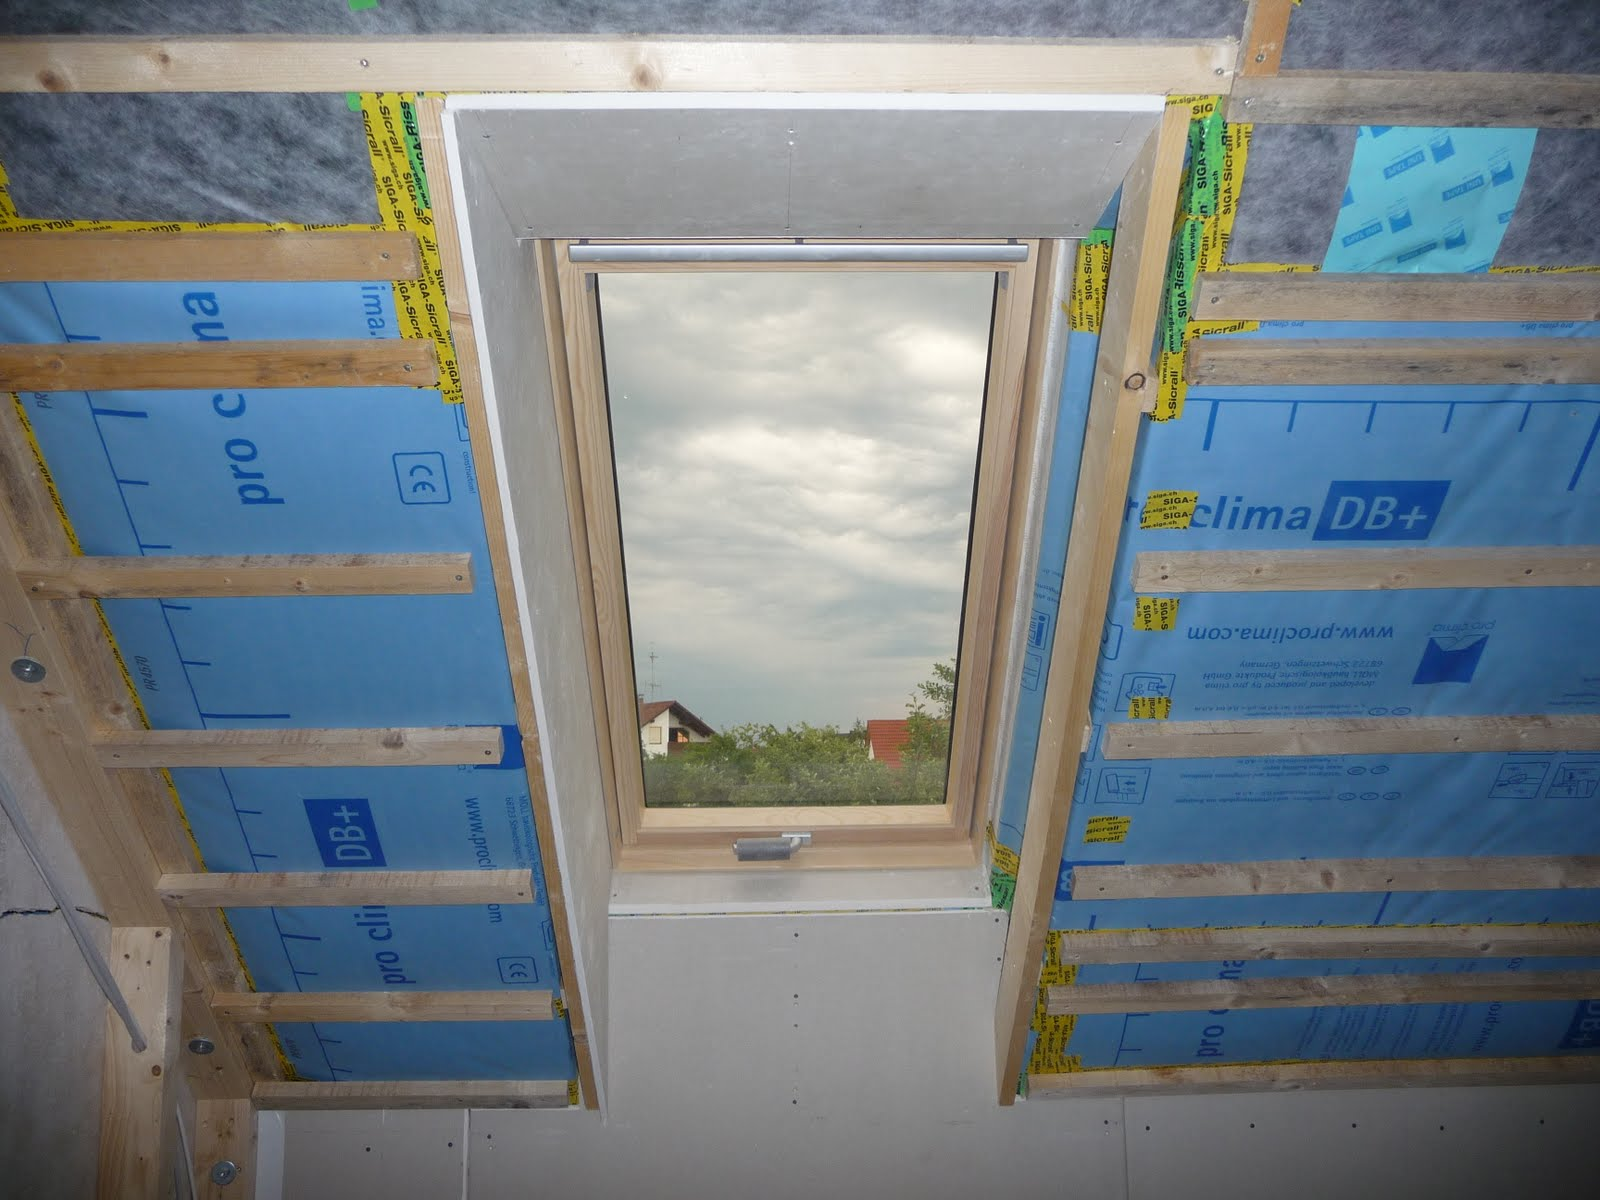 Dachfenster innen verkleiden cool dachfenster trockenbau with dachfenster innen verkleiden - Dachfenster innenfutter rigips ...